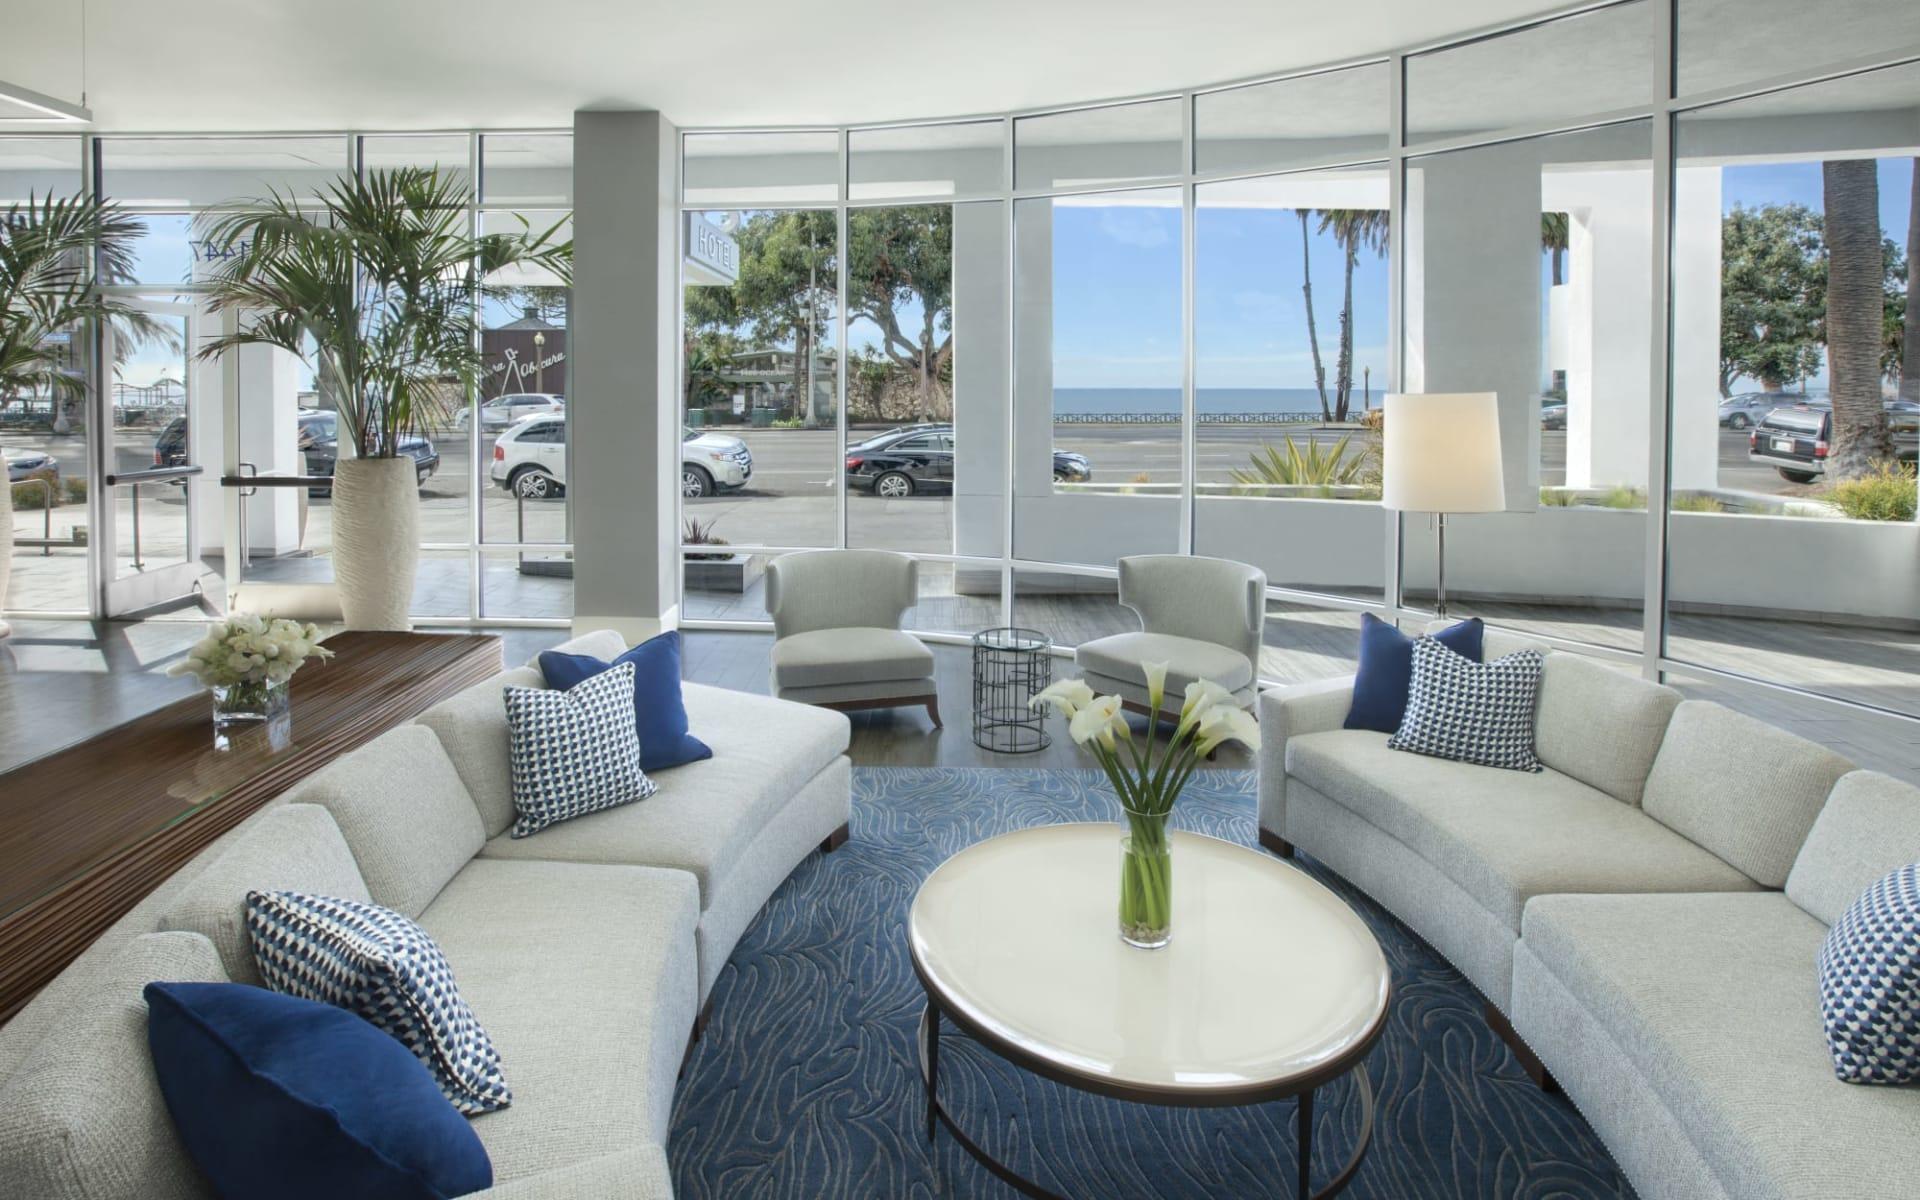 Ocean View Hotel Santa Monica:  Ocean View Hotel - Lobby